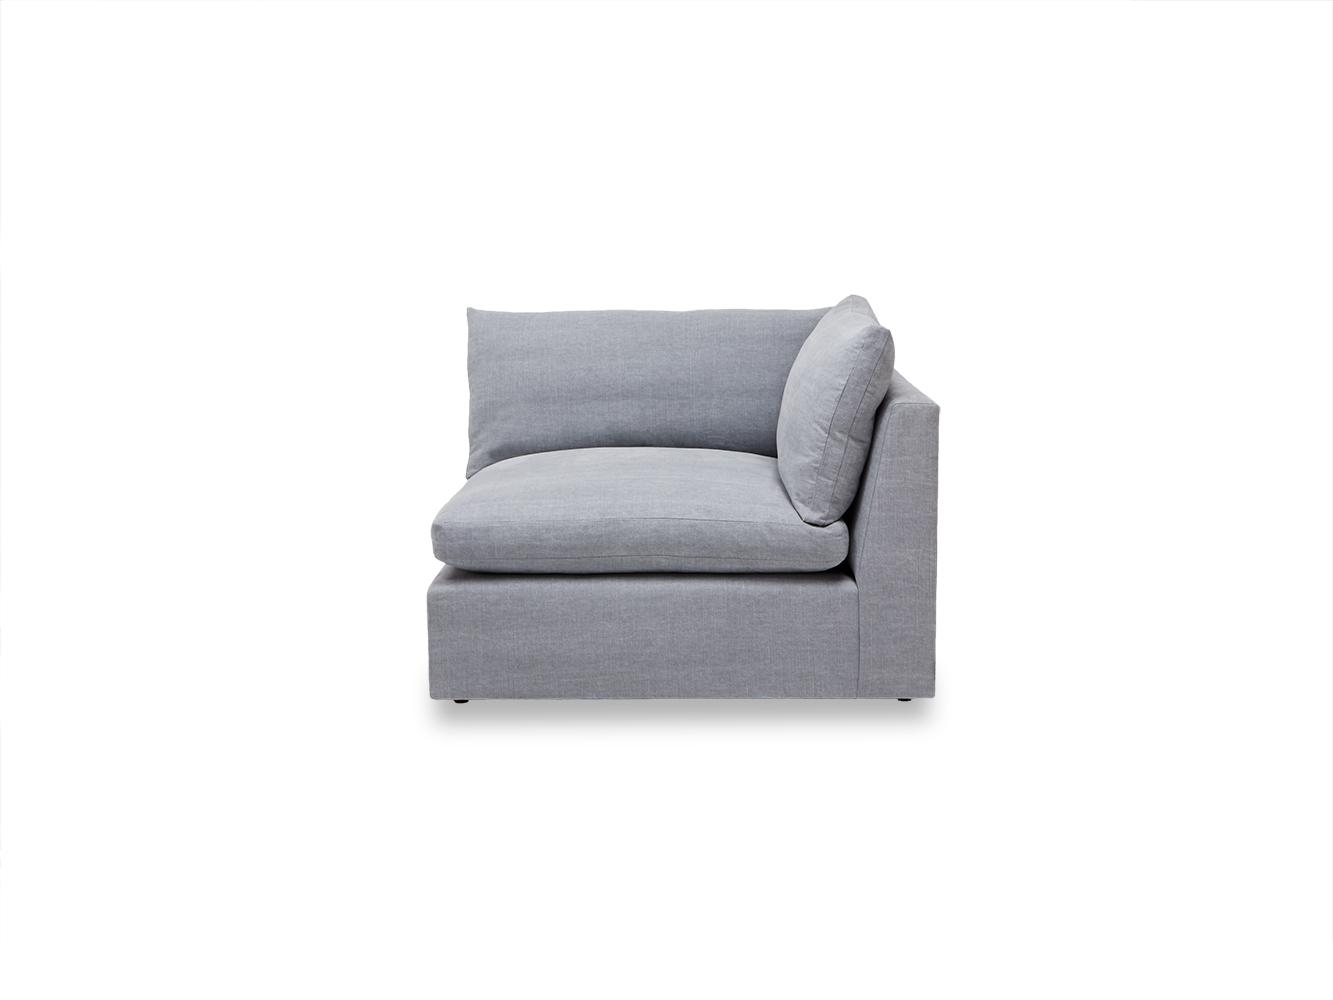 Large left hand Cuddlemuffin Modular Corner Sofa in Thatch house fabric